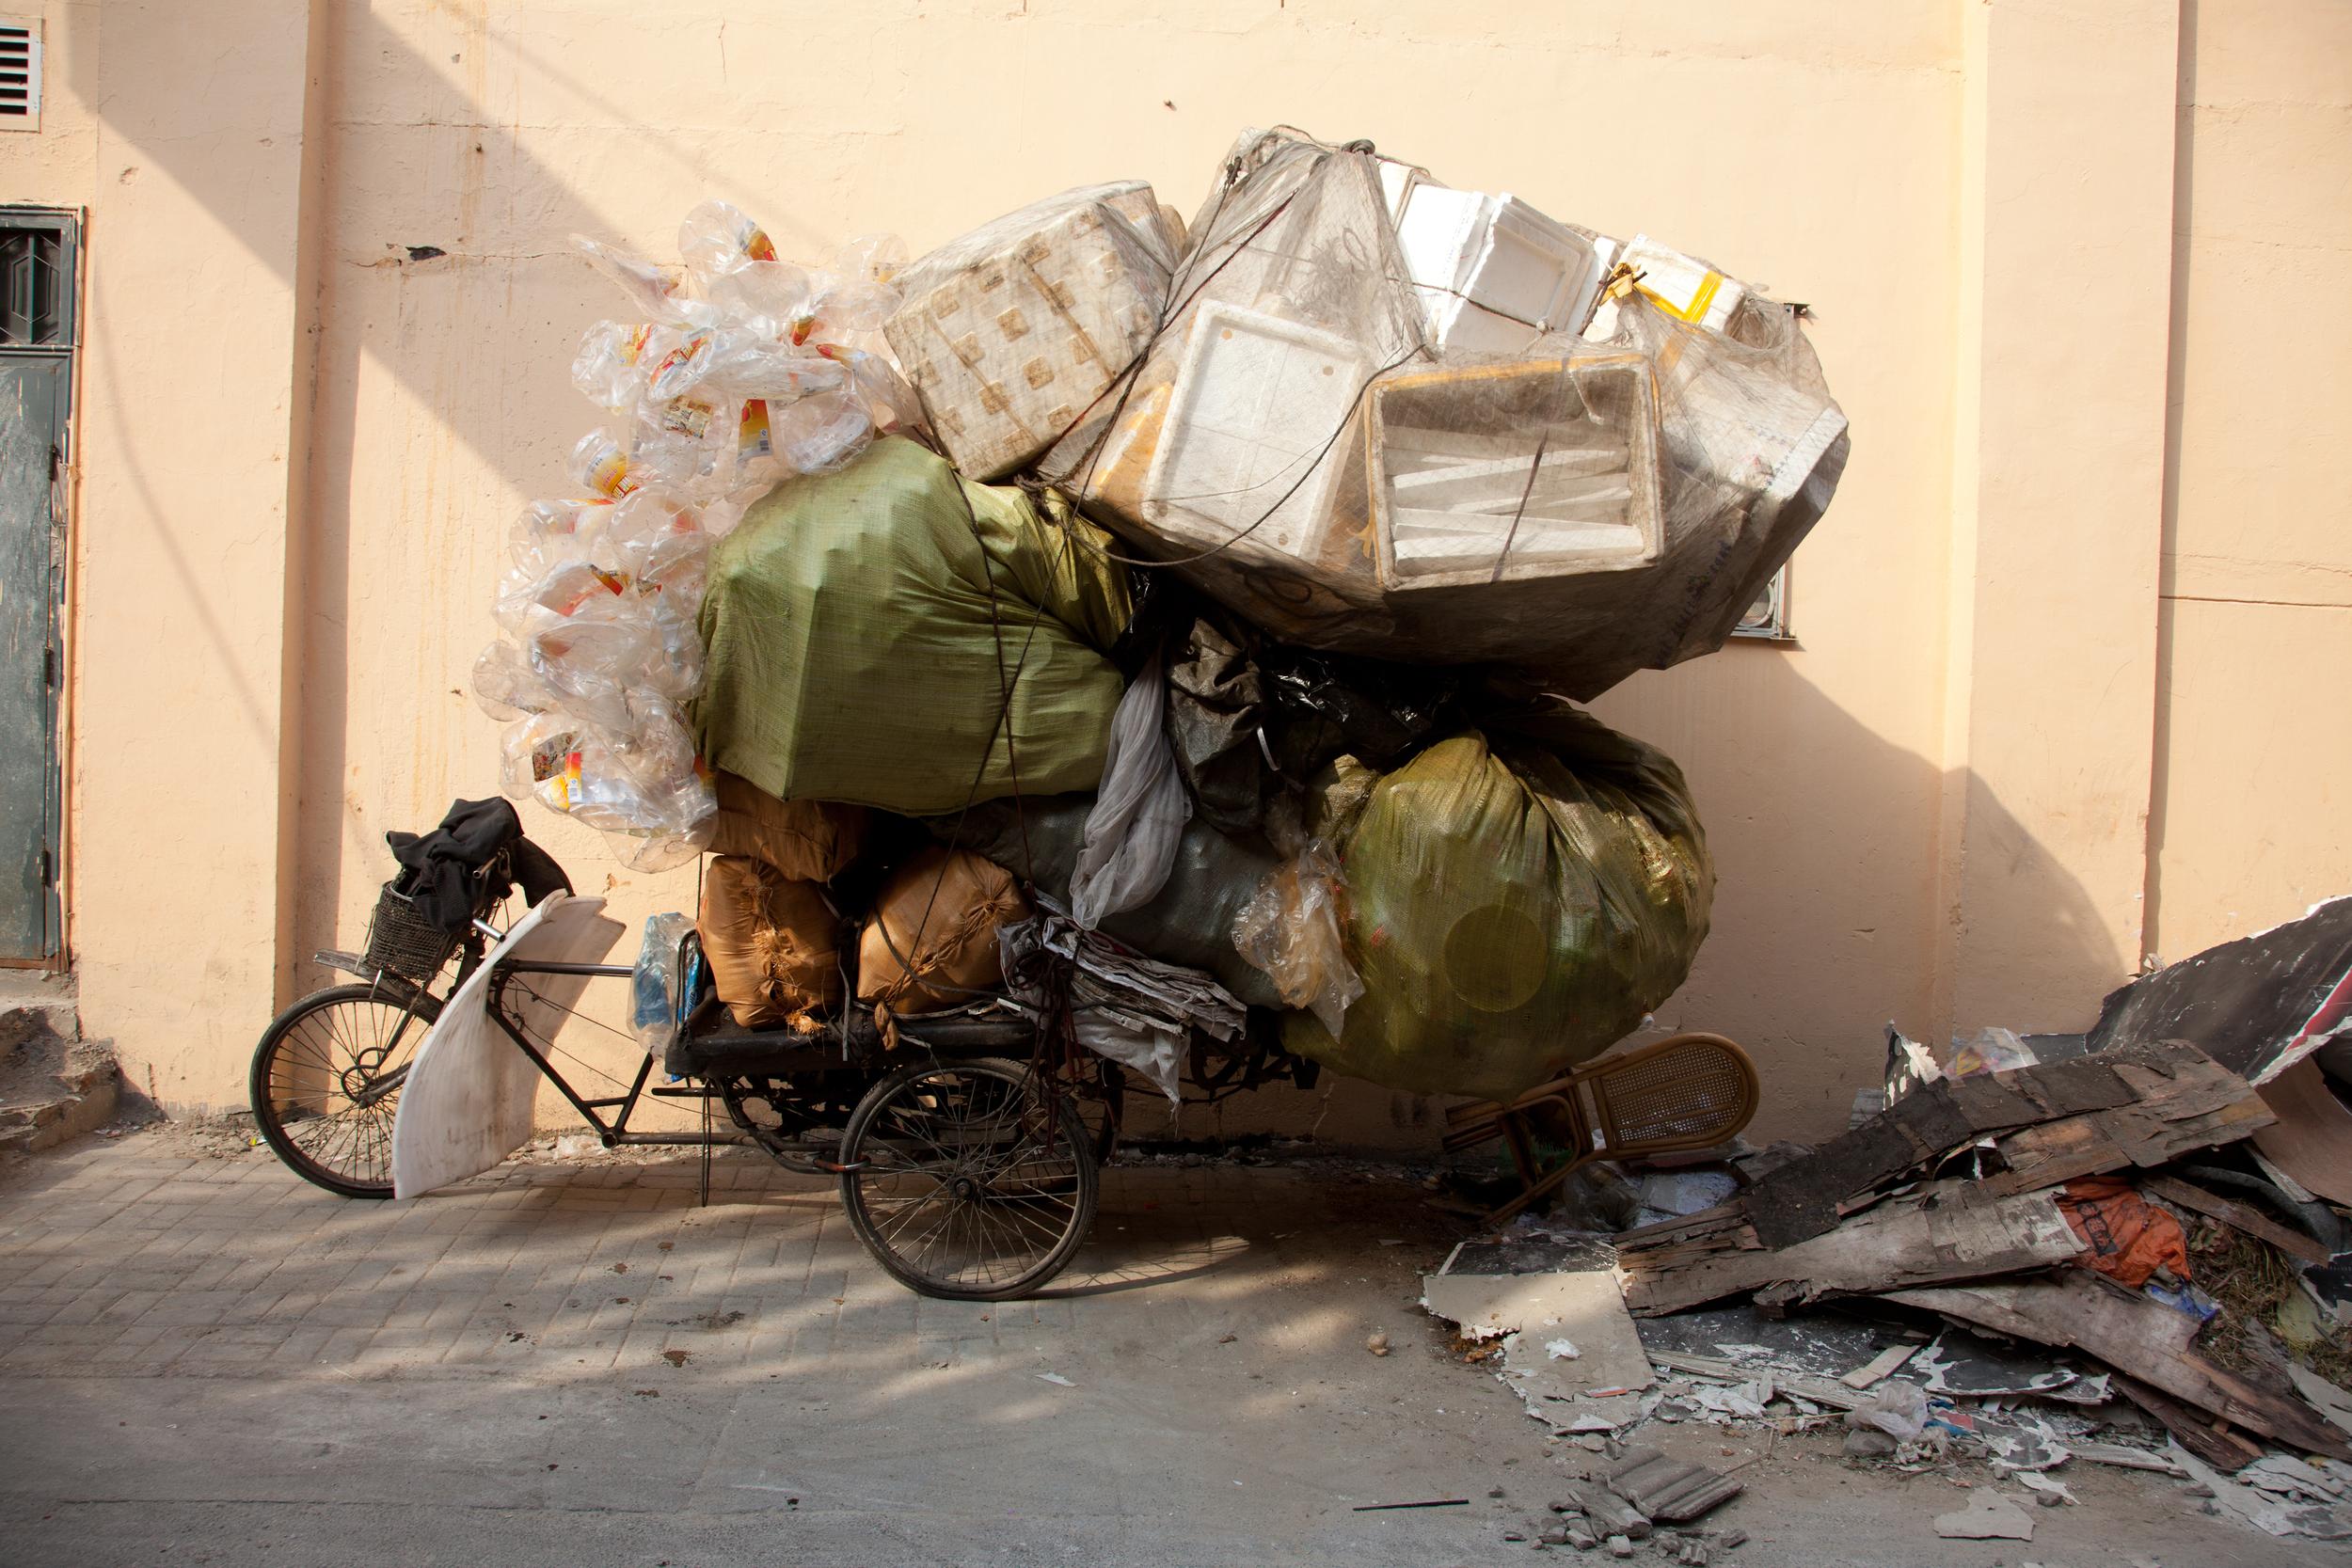 My local neighbourhood recycling unit